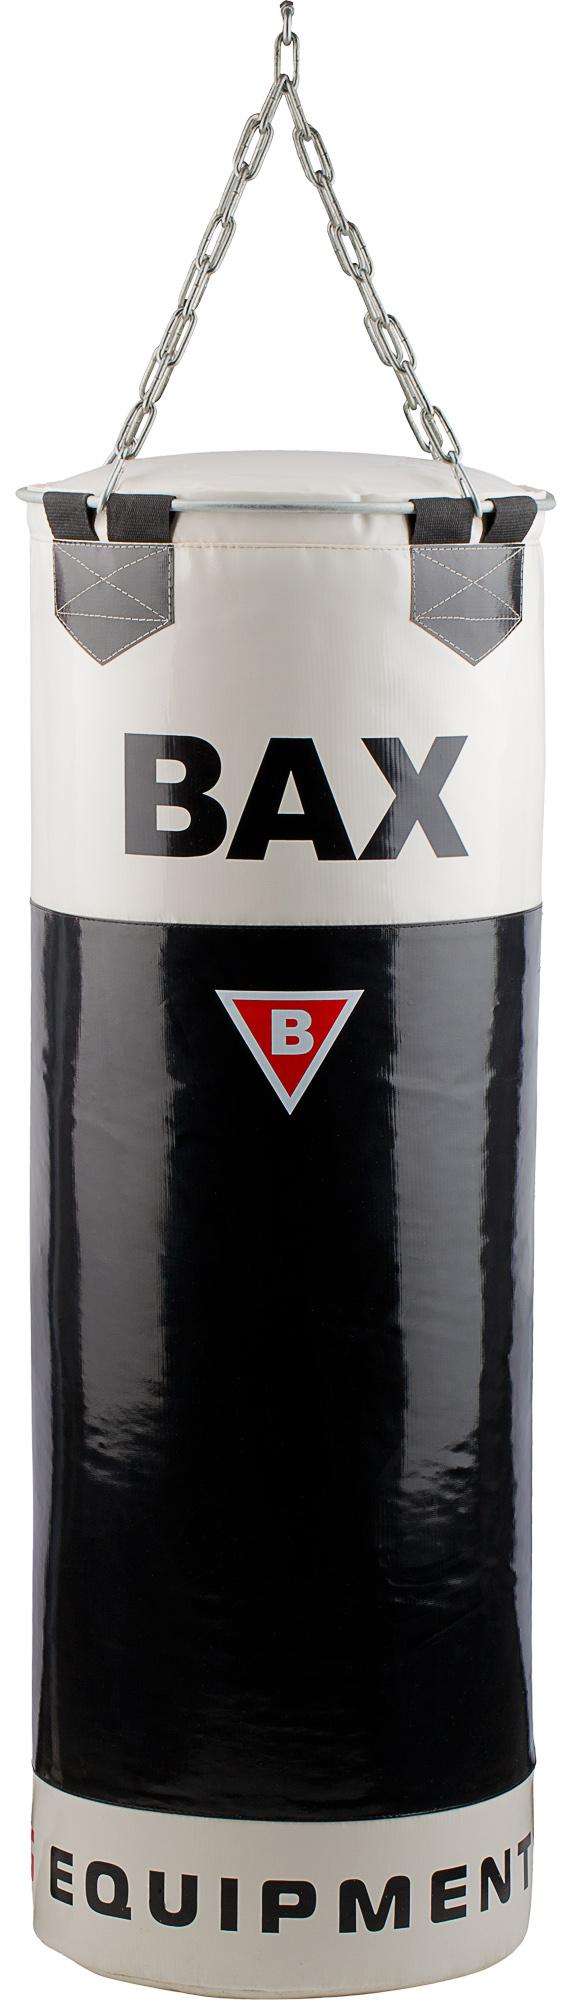 цена на Bax Мешок набивной Bax, 80 кг